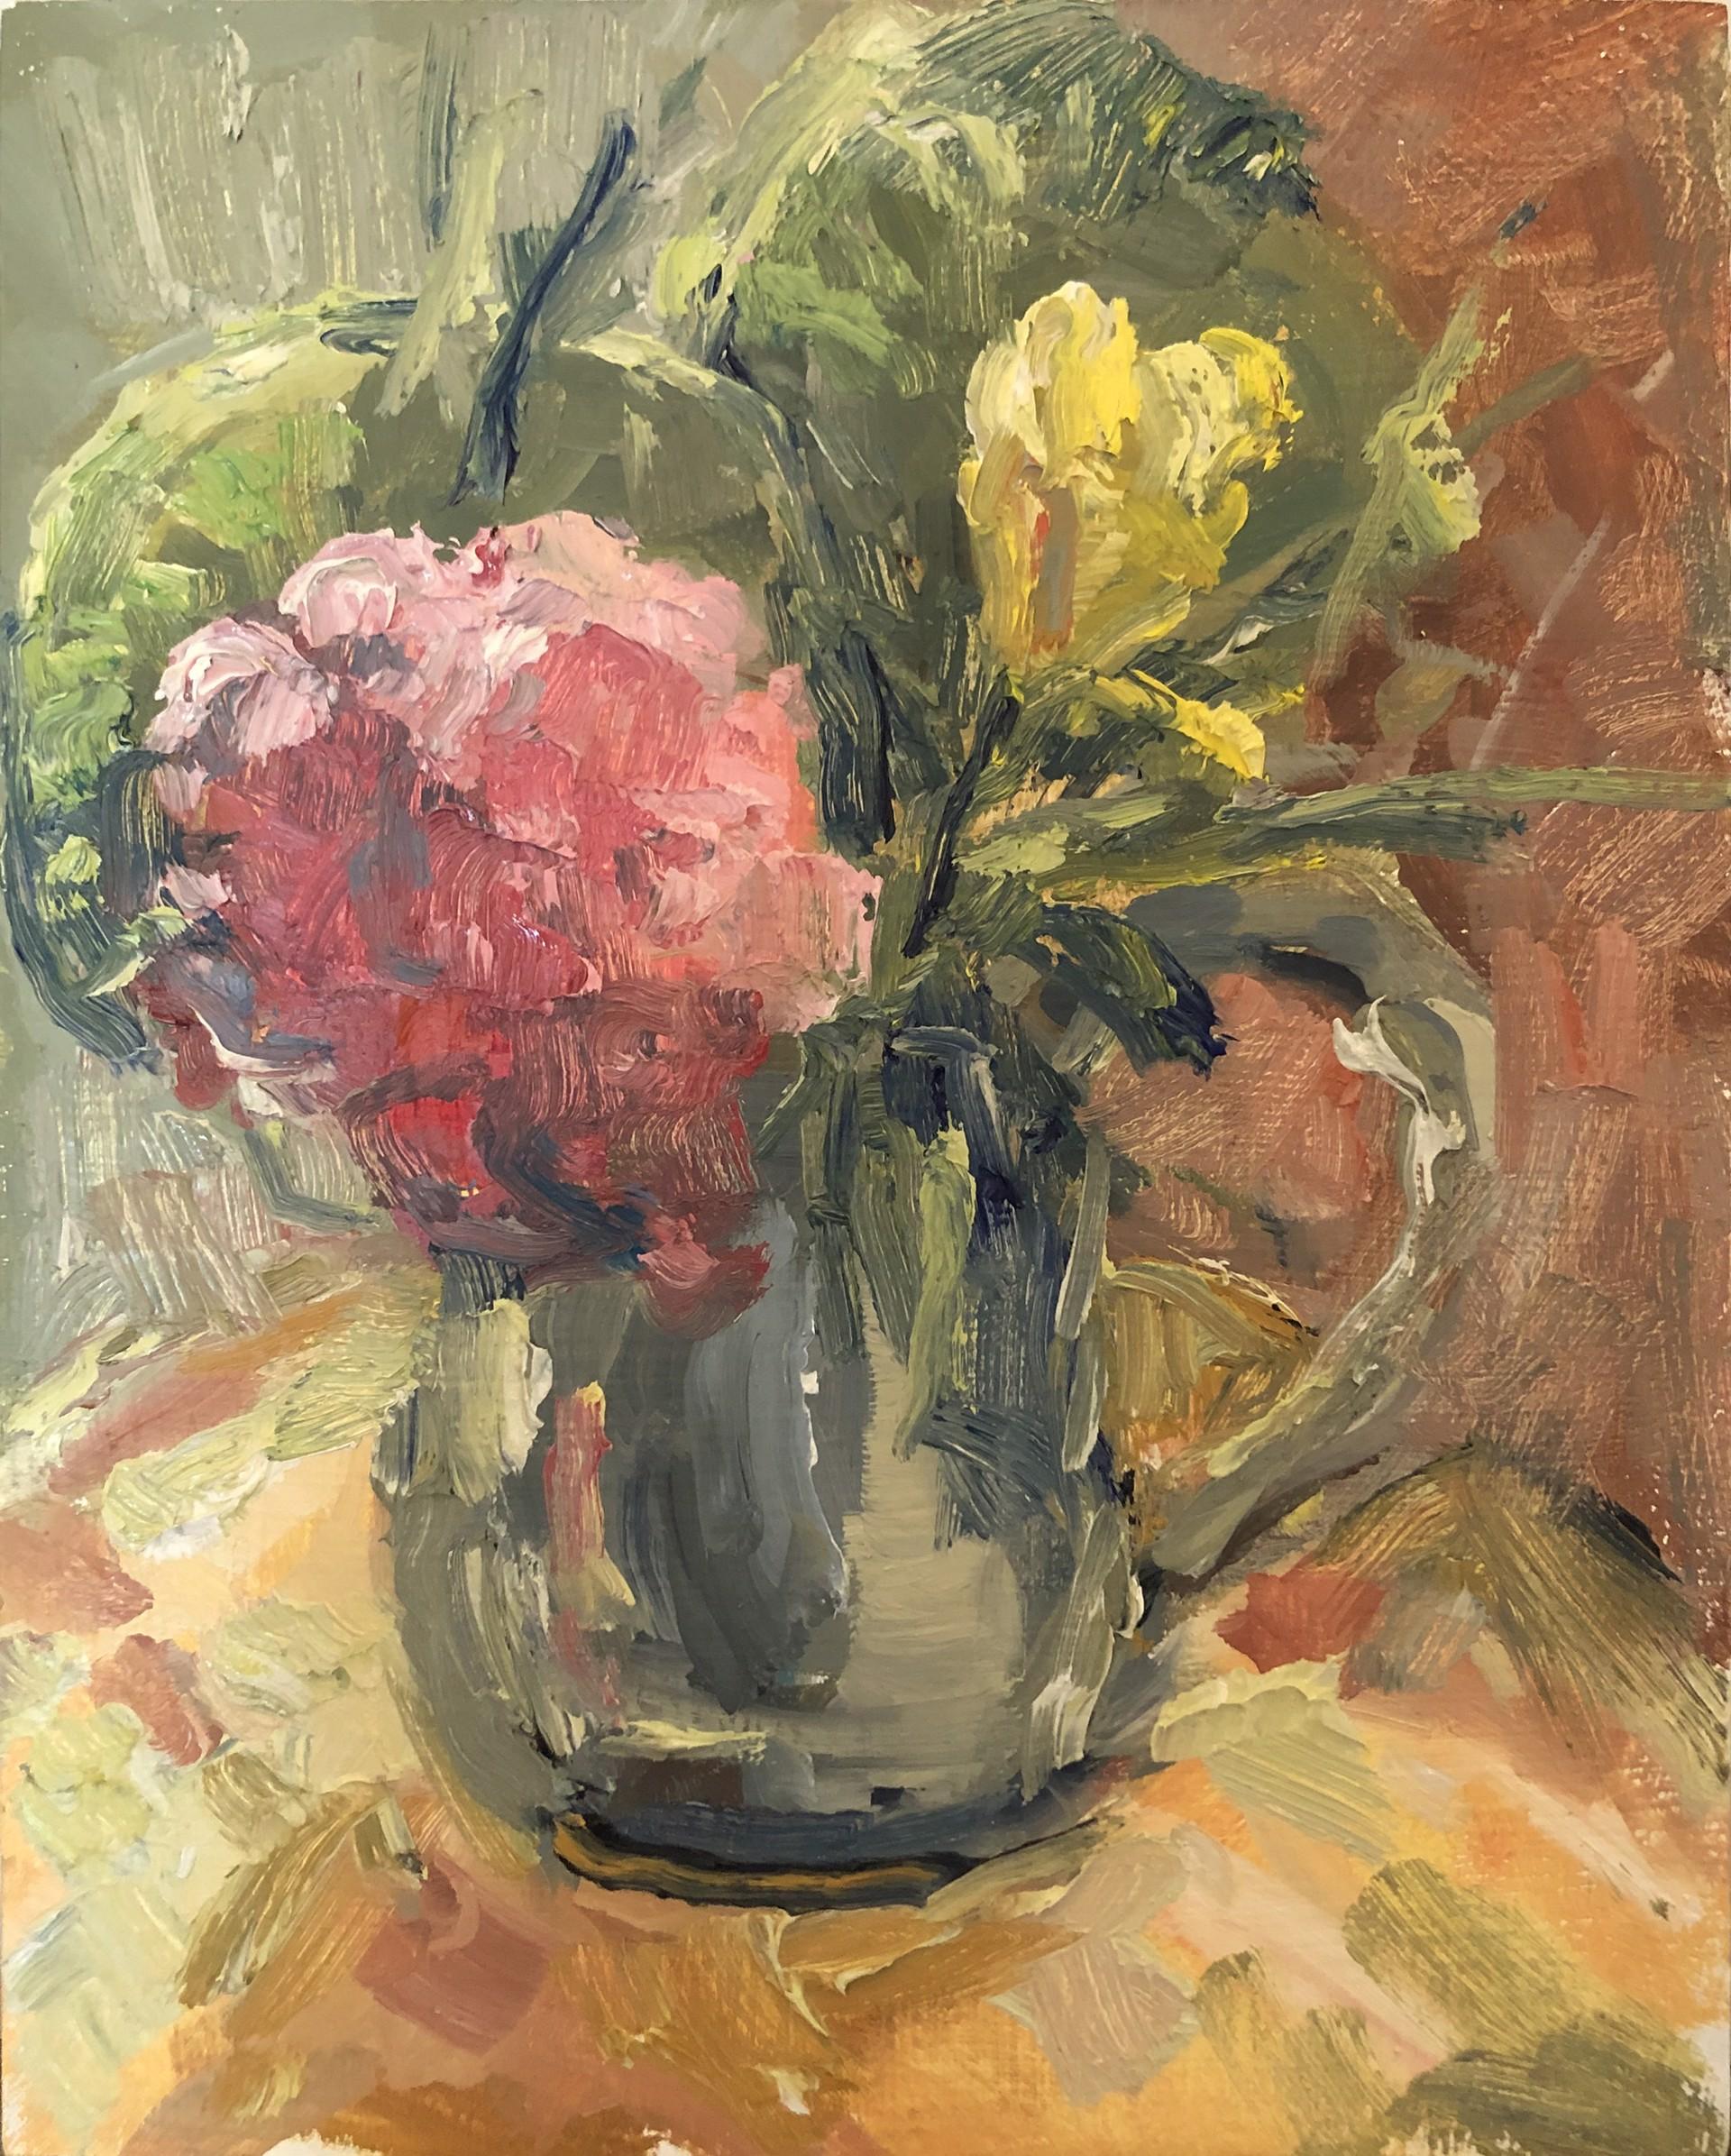 Flowers From My Garden by Karen Hewitt Hagan